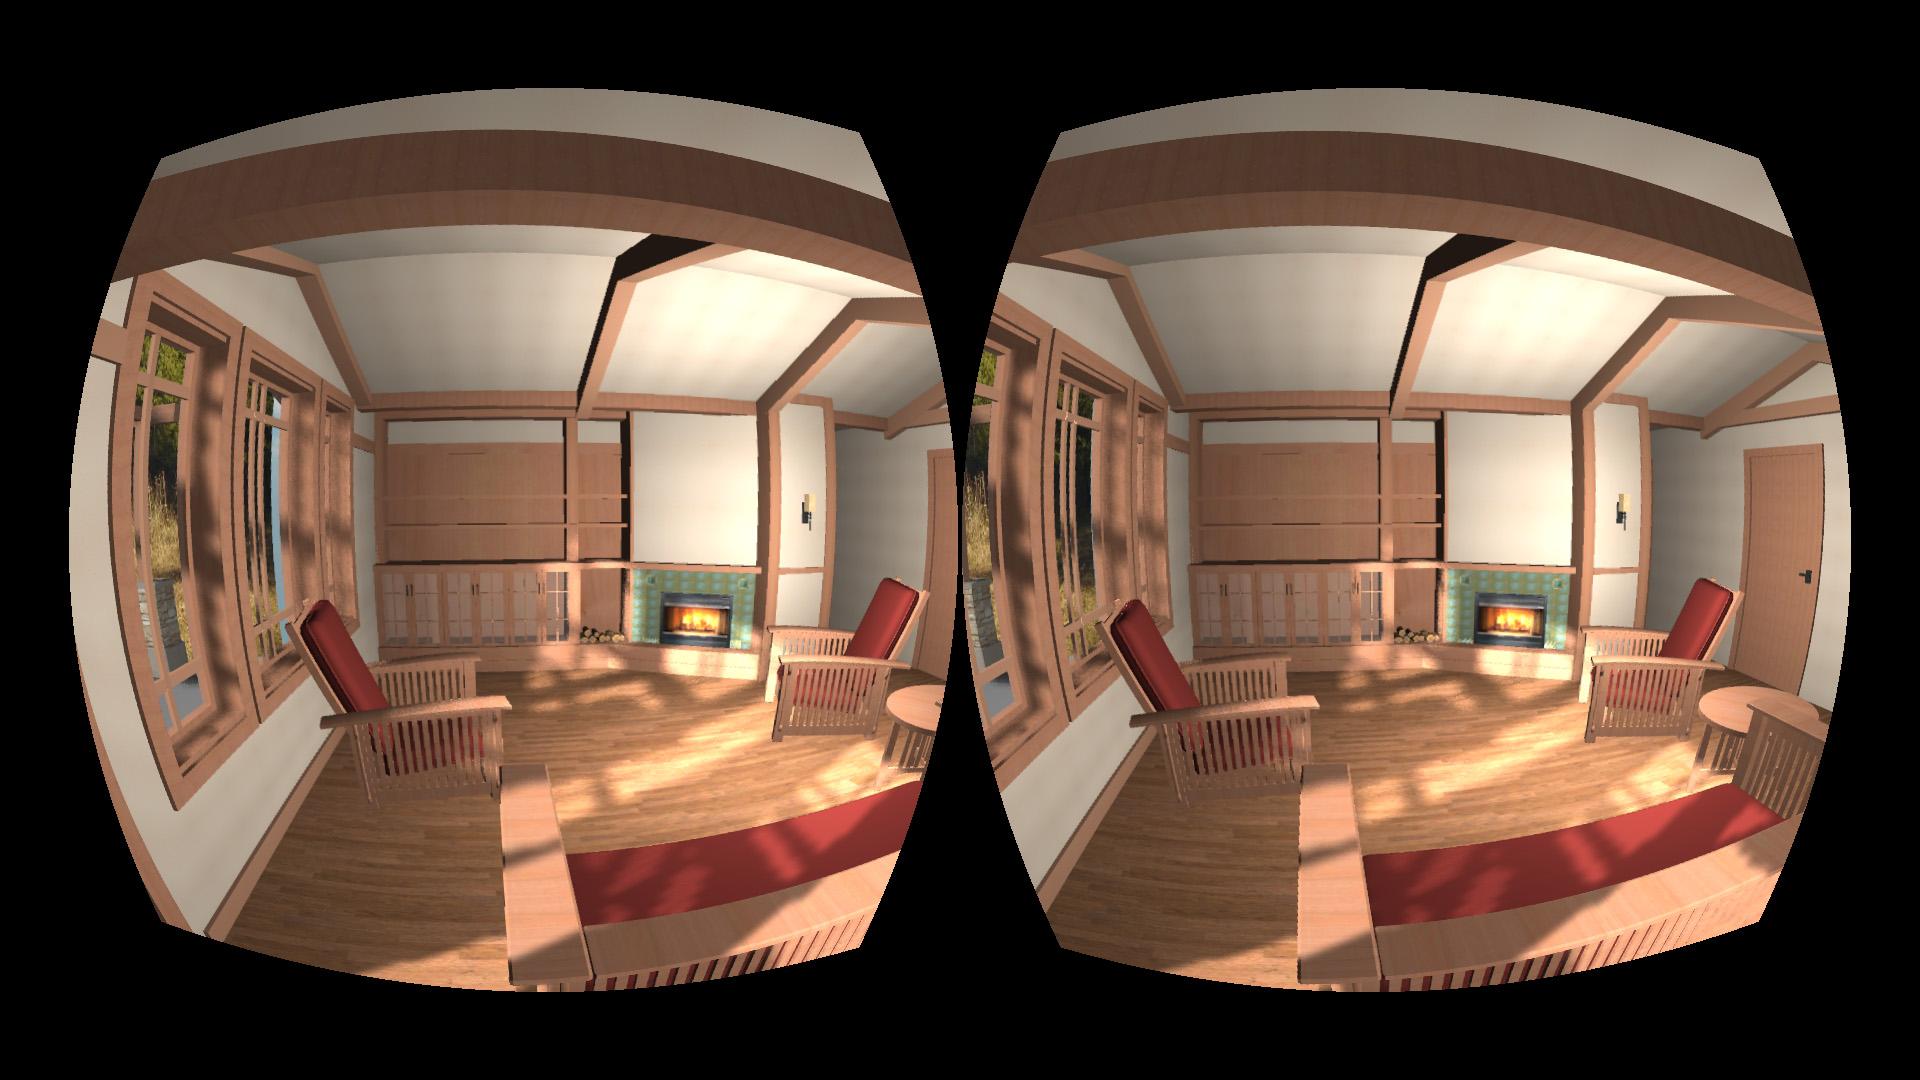 Architecture's Virtual Reality